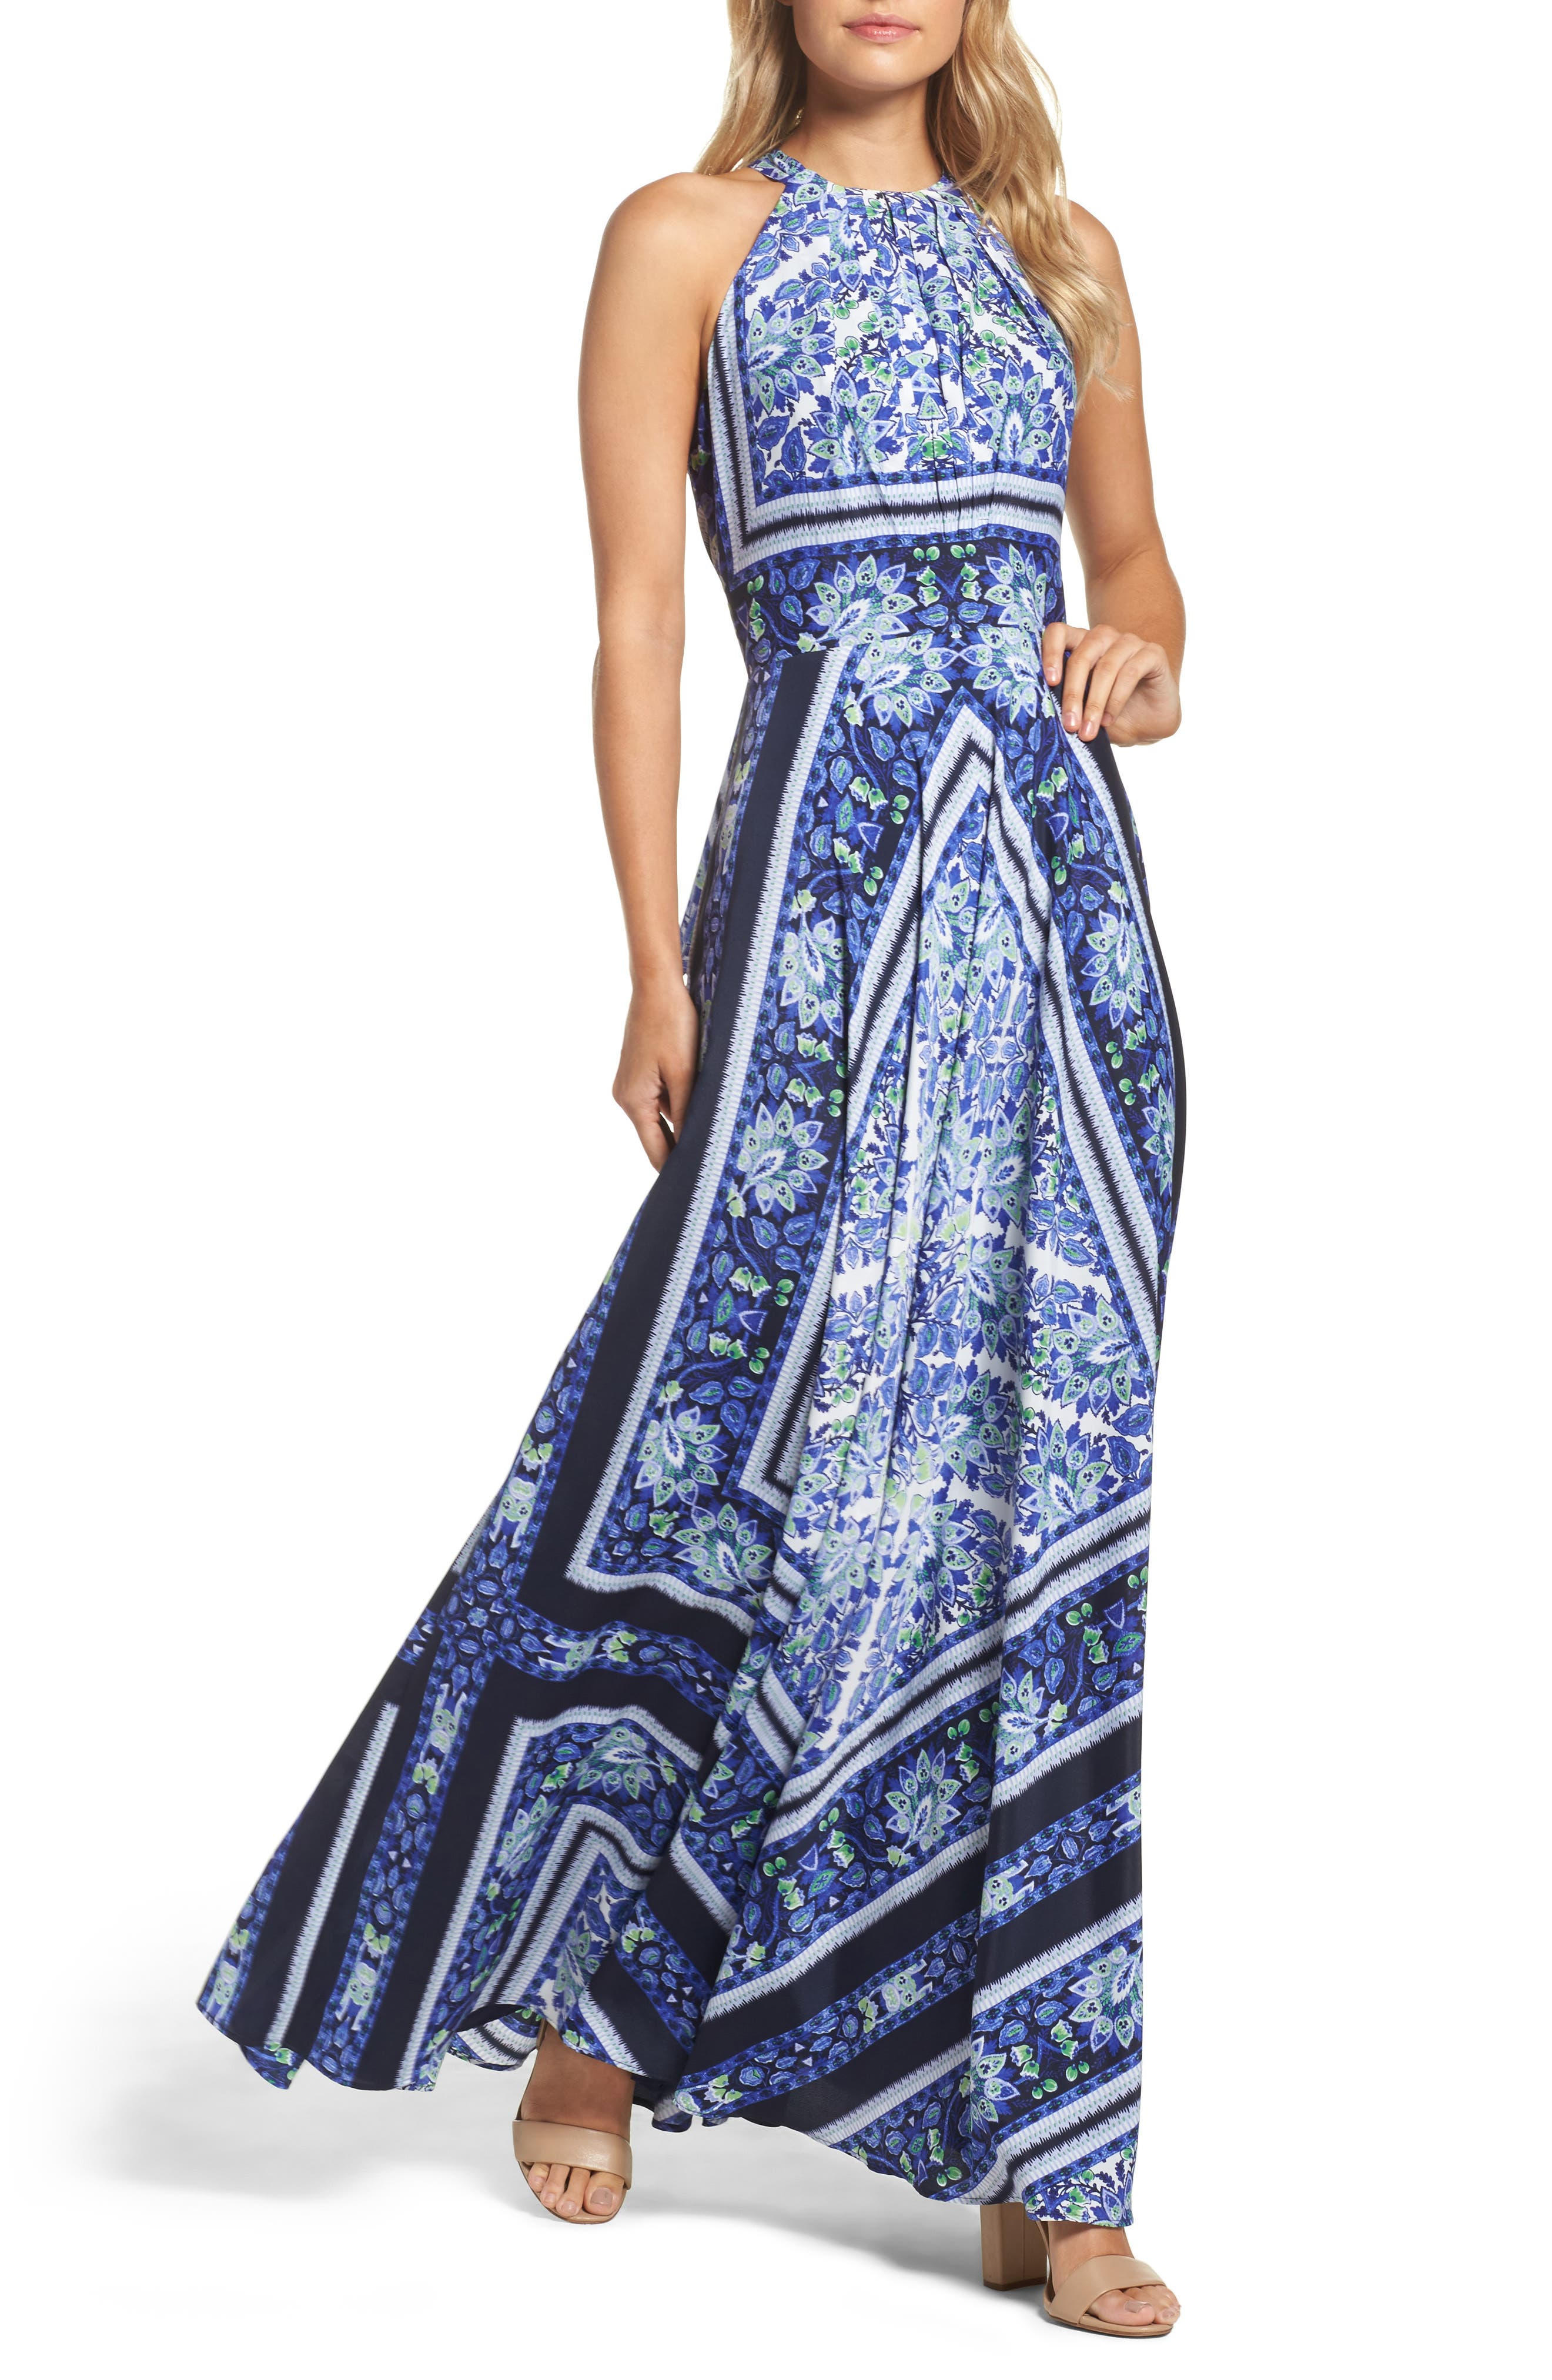 Royal Blue Chiffon Dress at Dillard's